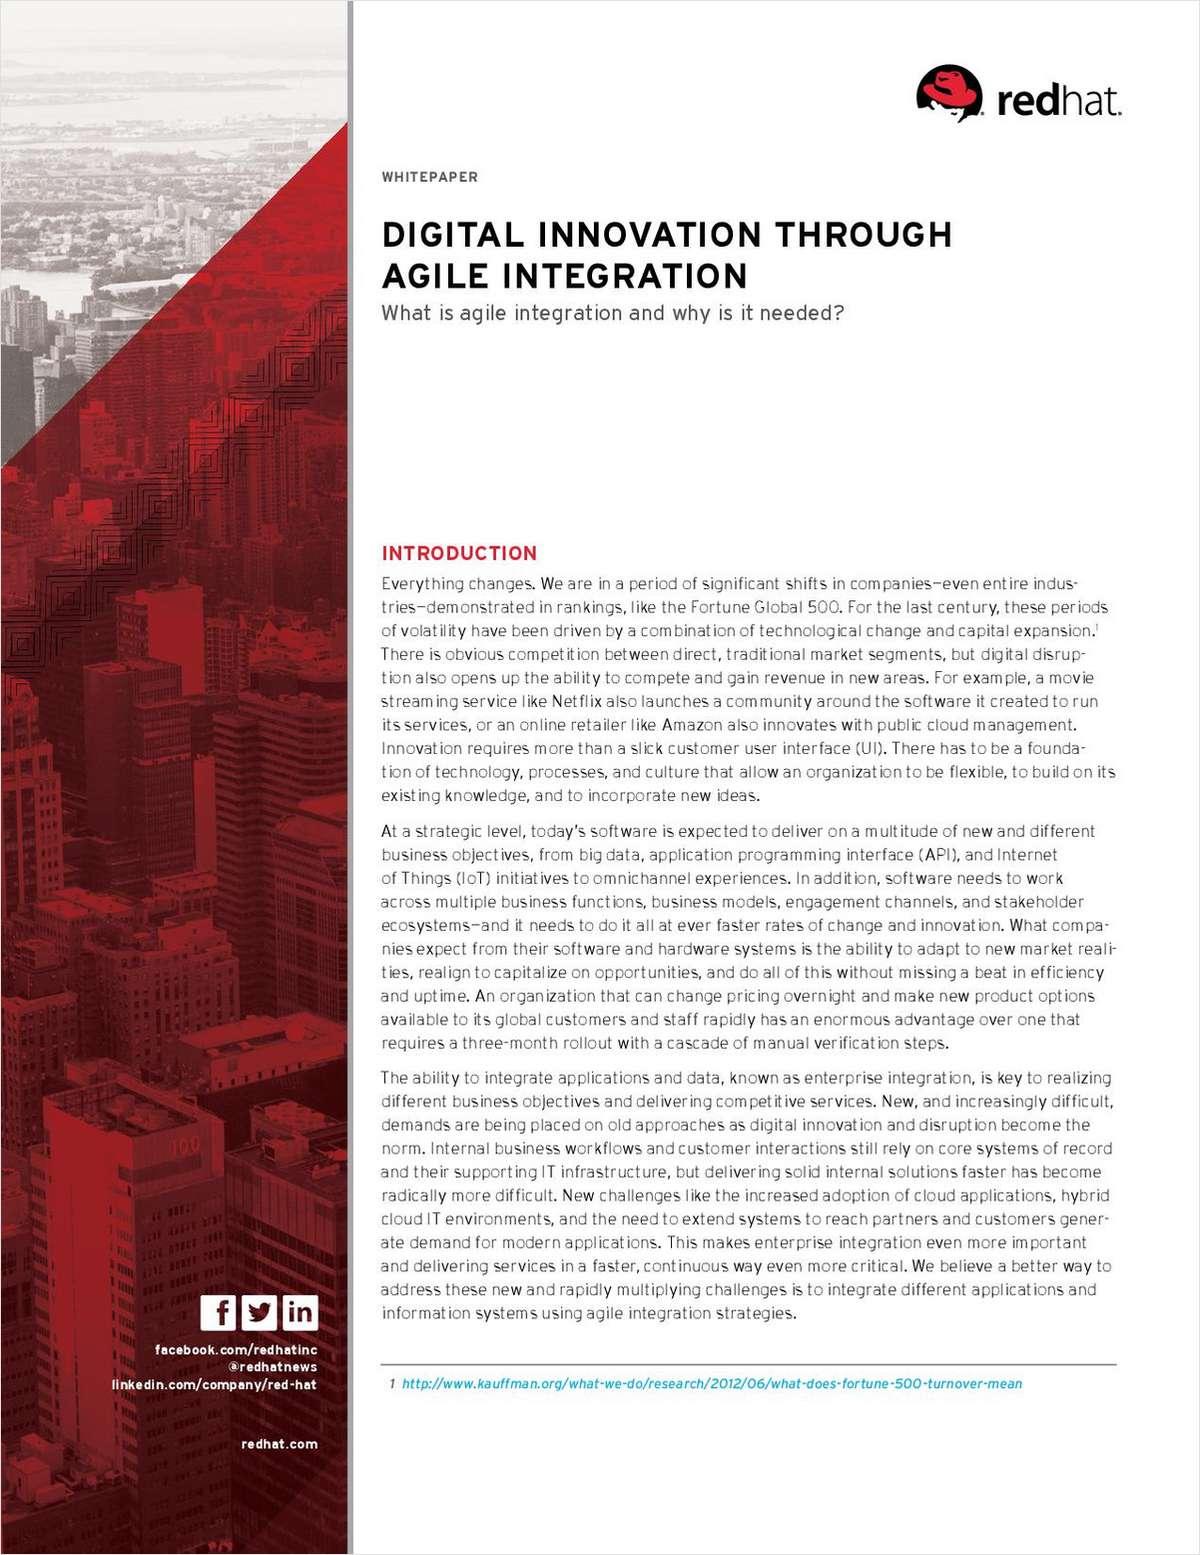 Digital Innovation Through Agile Integration